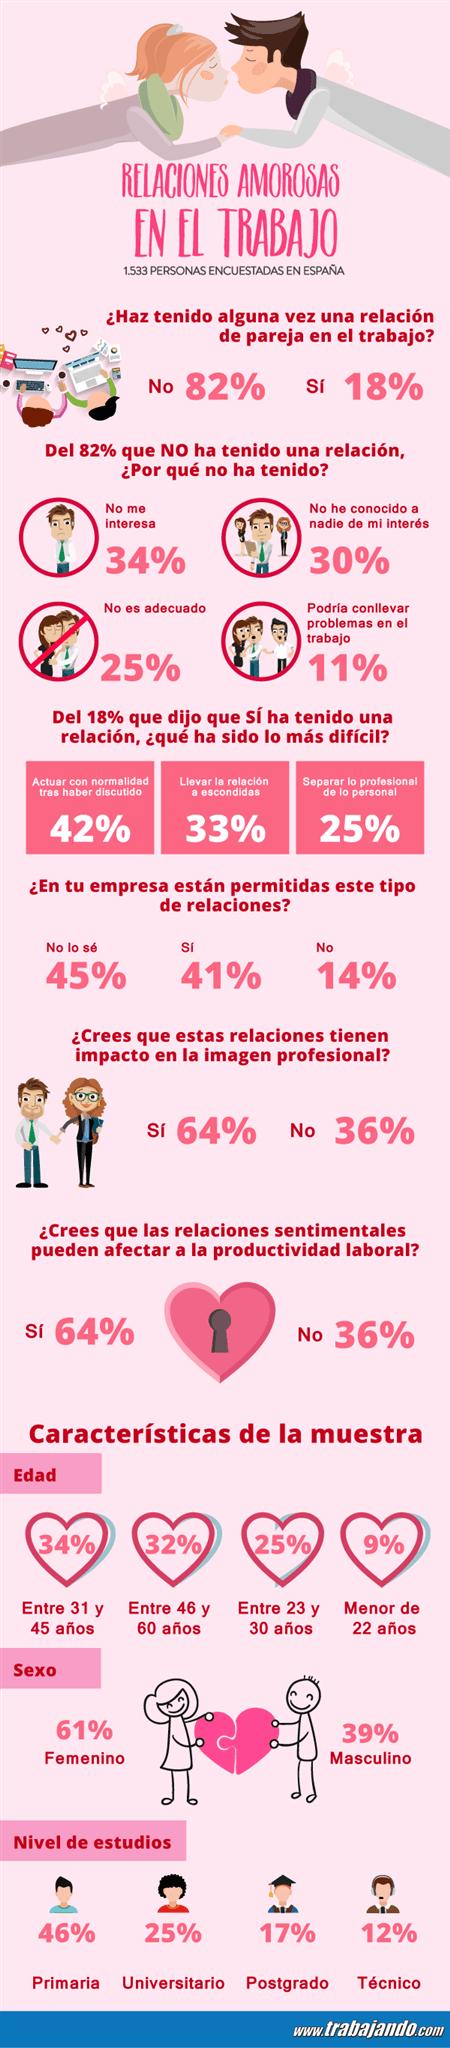 Infografia-Relaciones-Sentimentales